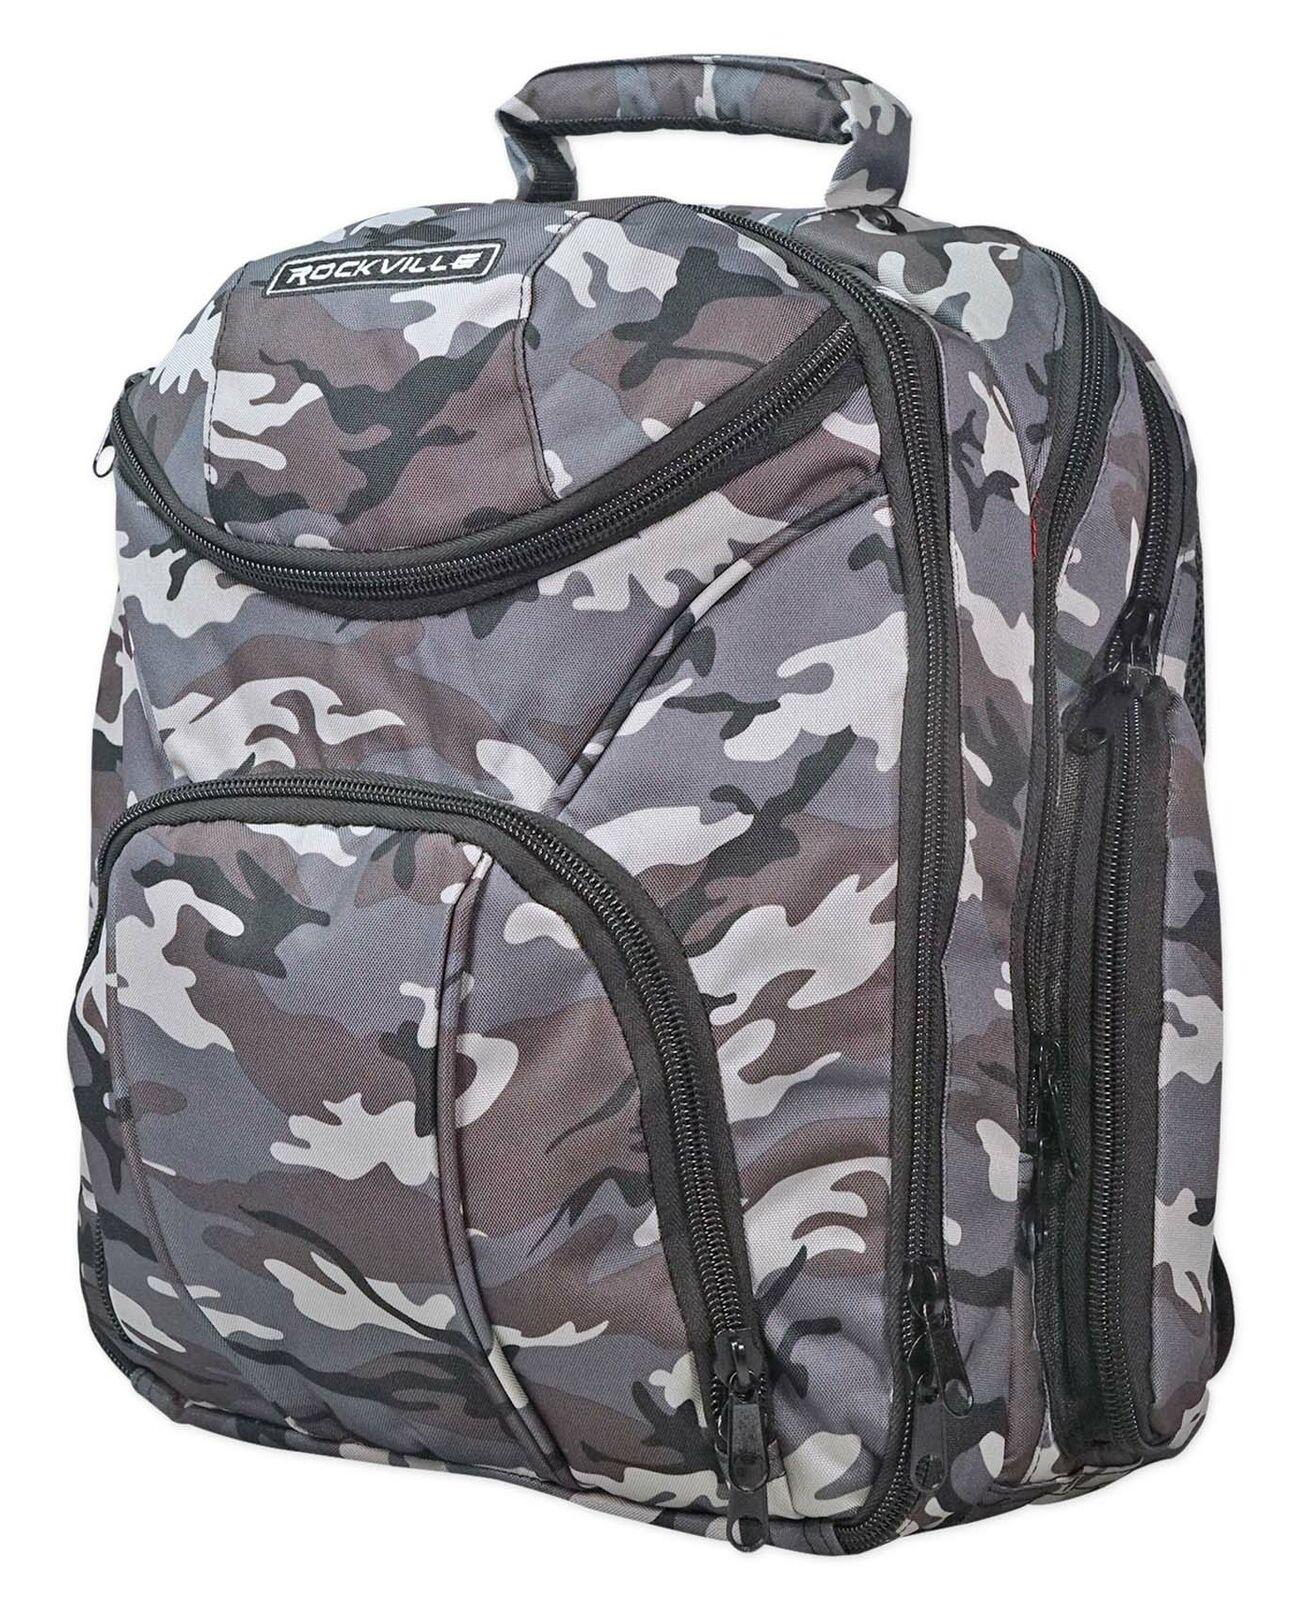 Rockville Travel Case Camo Backpack Bag For Mackie PROFX16V2 Mixer